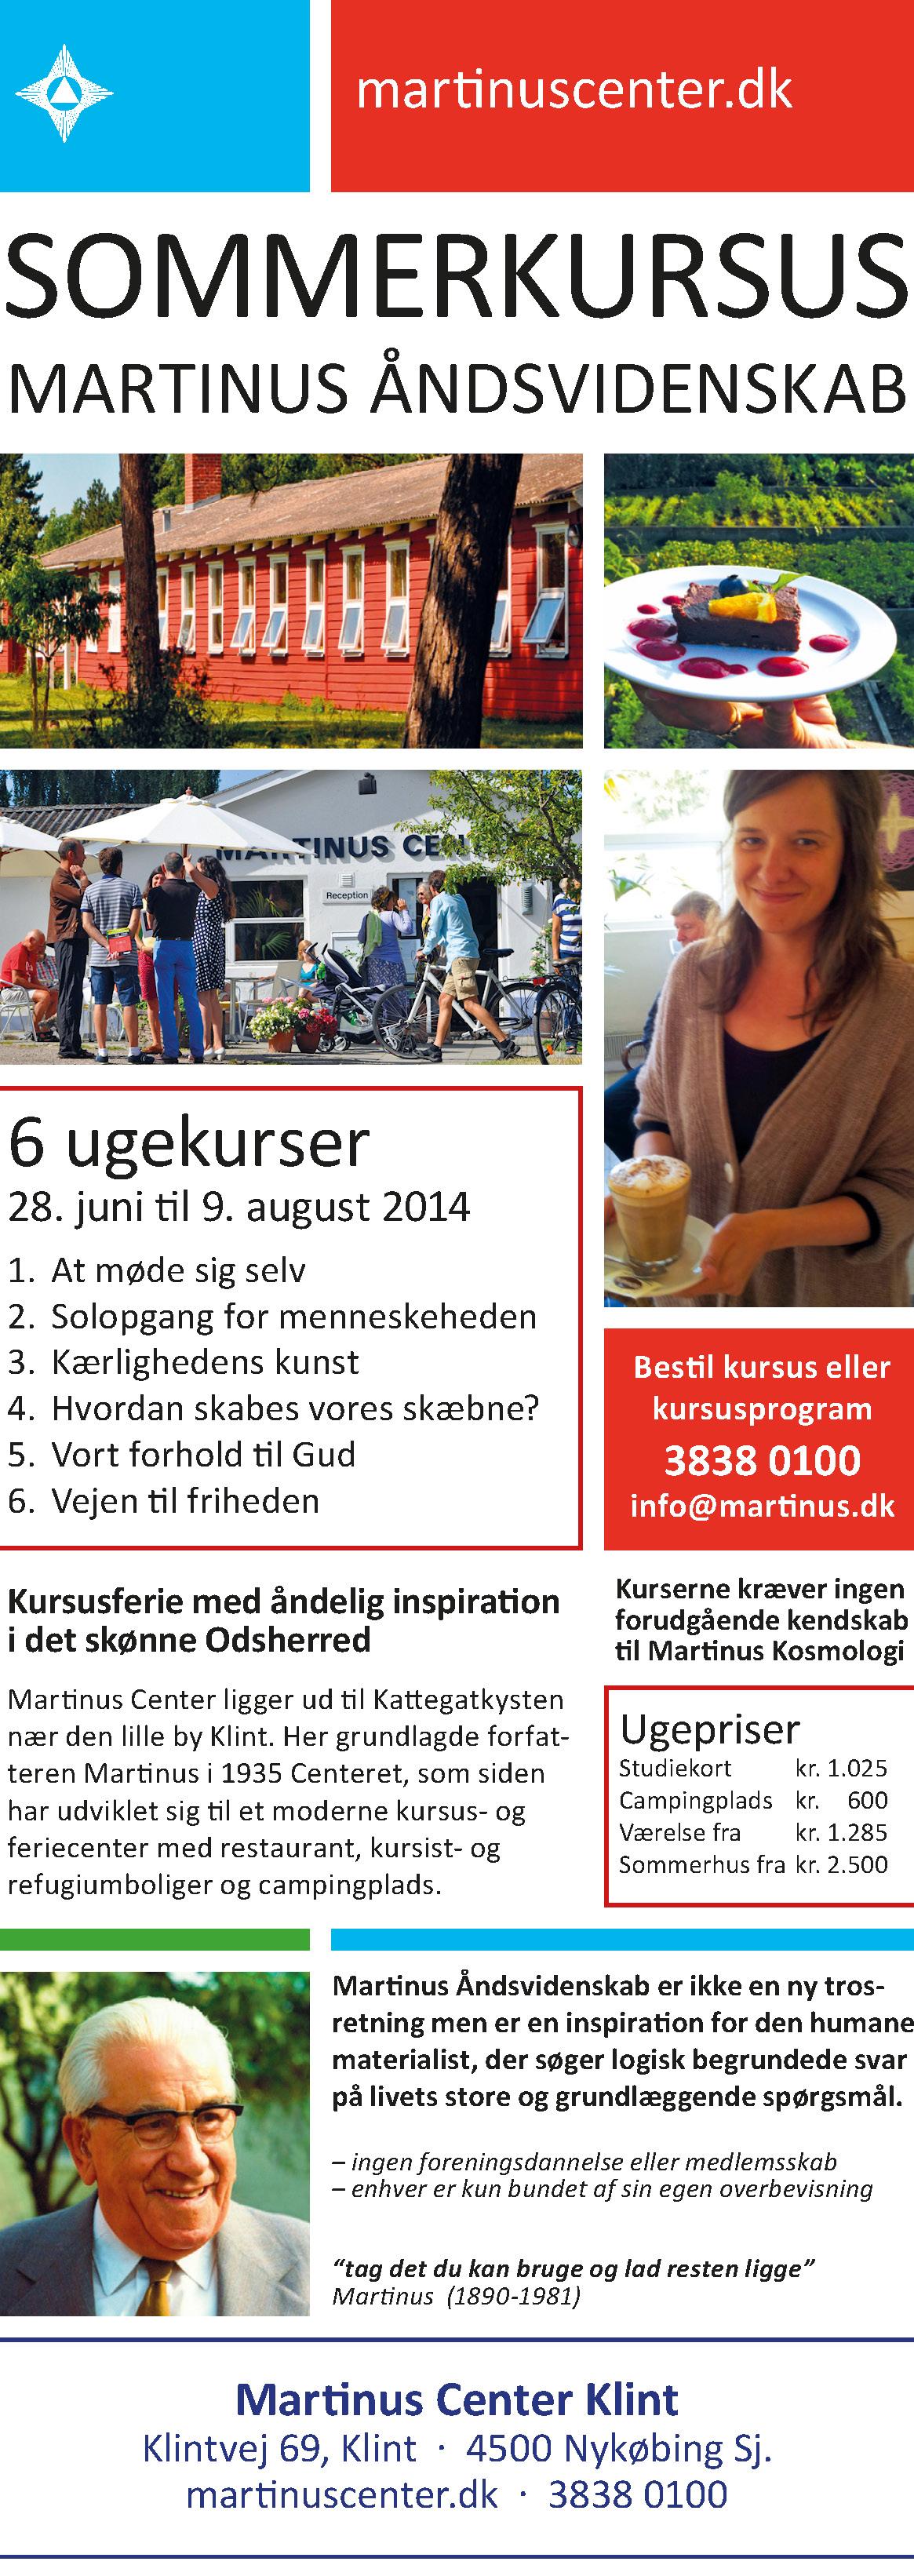 Annonce til Nyt Aspekt 2014-tryk